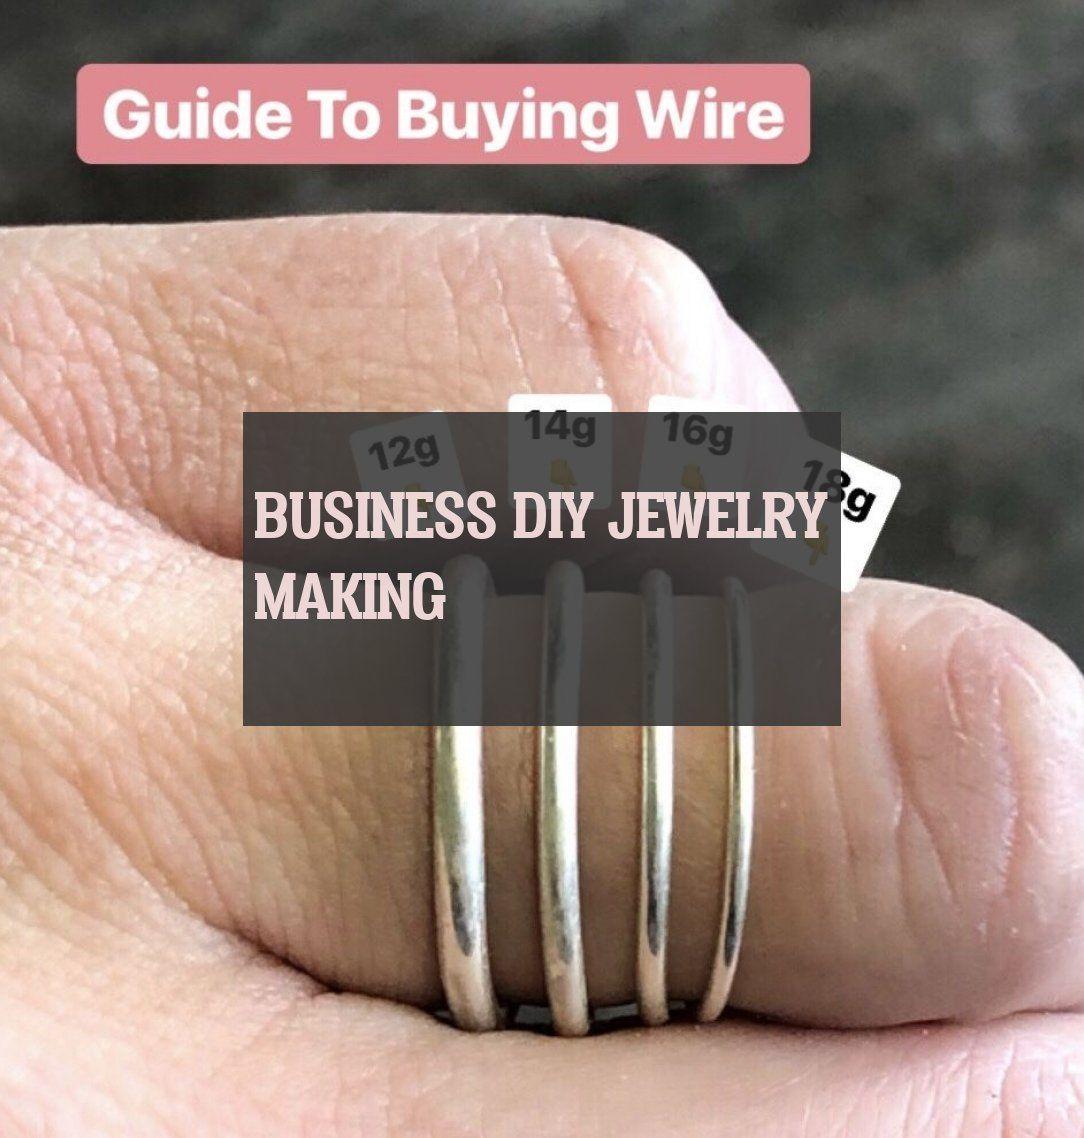 Business diy jewelry making